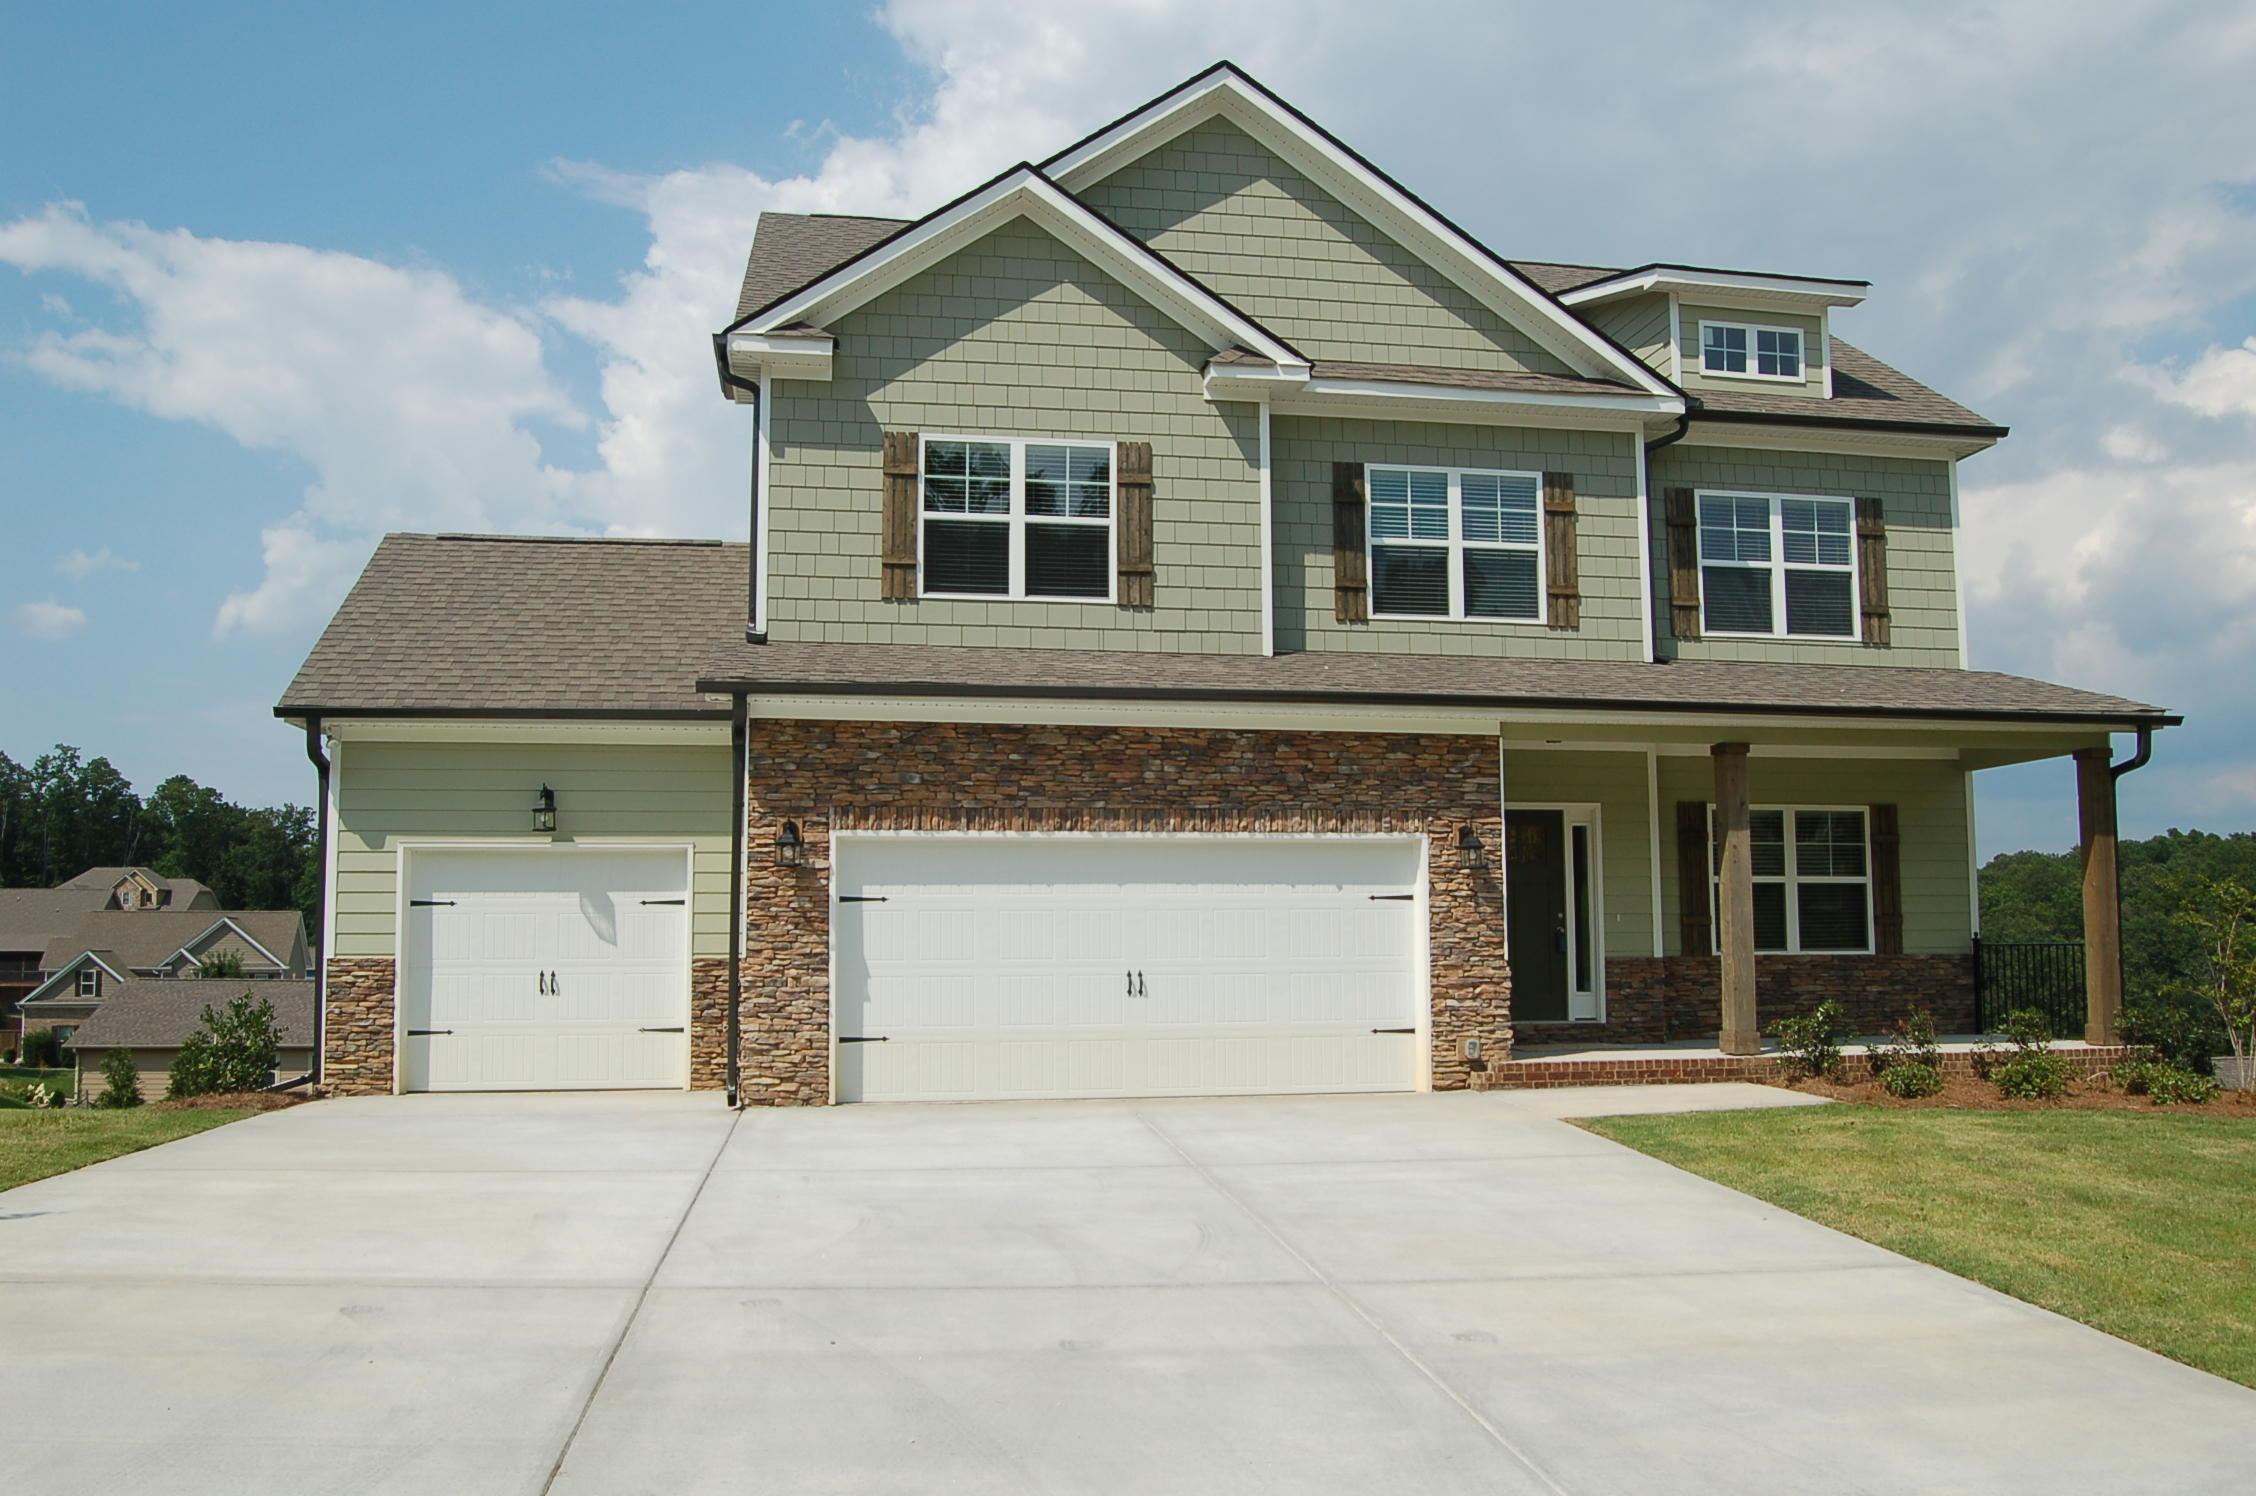 7947  Chianti 105 Way, Chattanooga, Tennessee